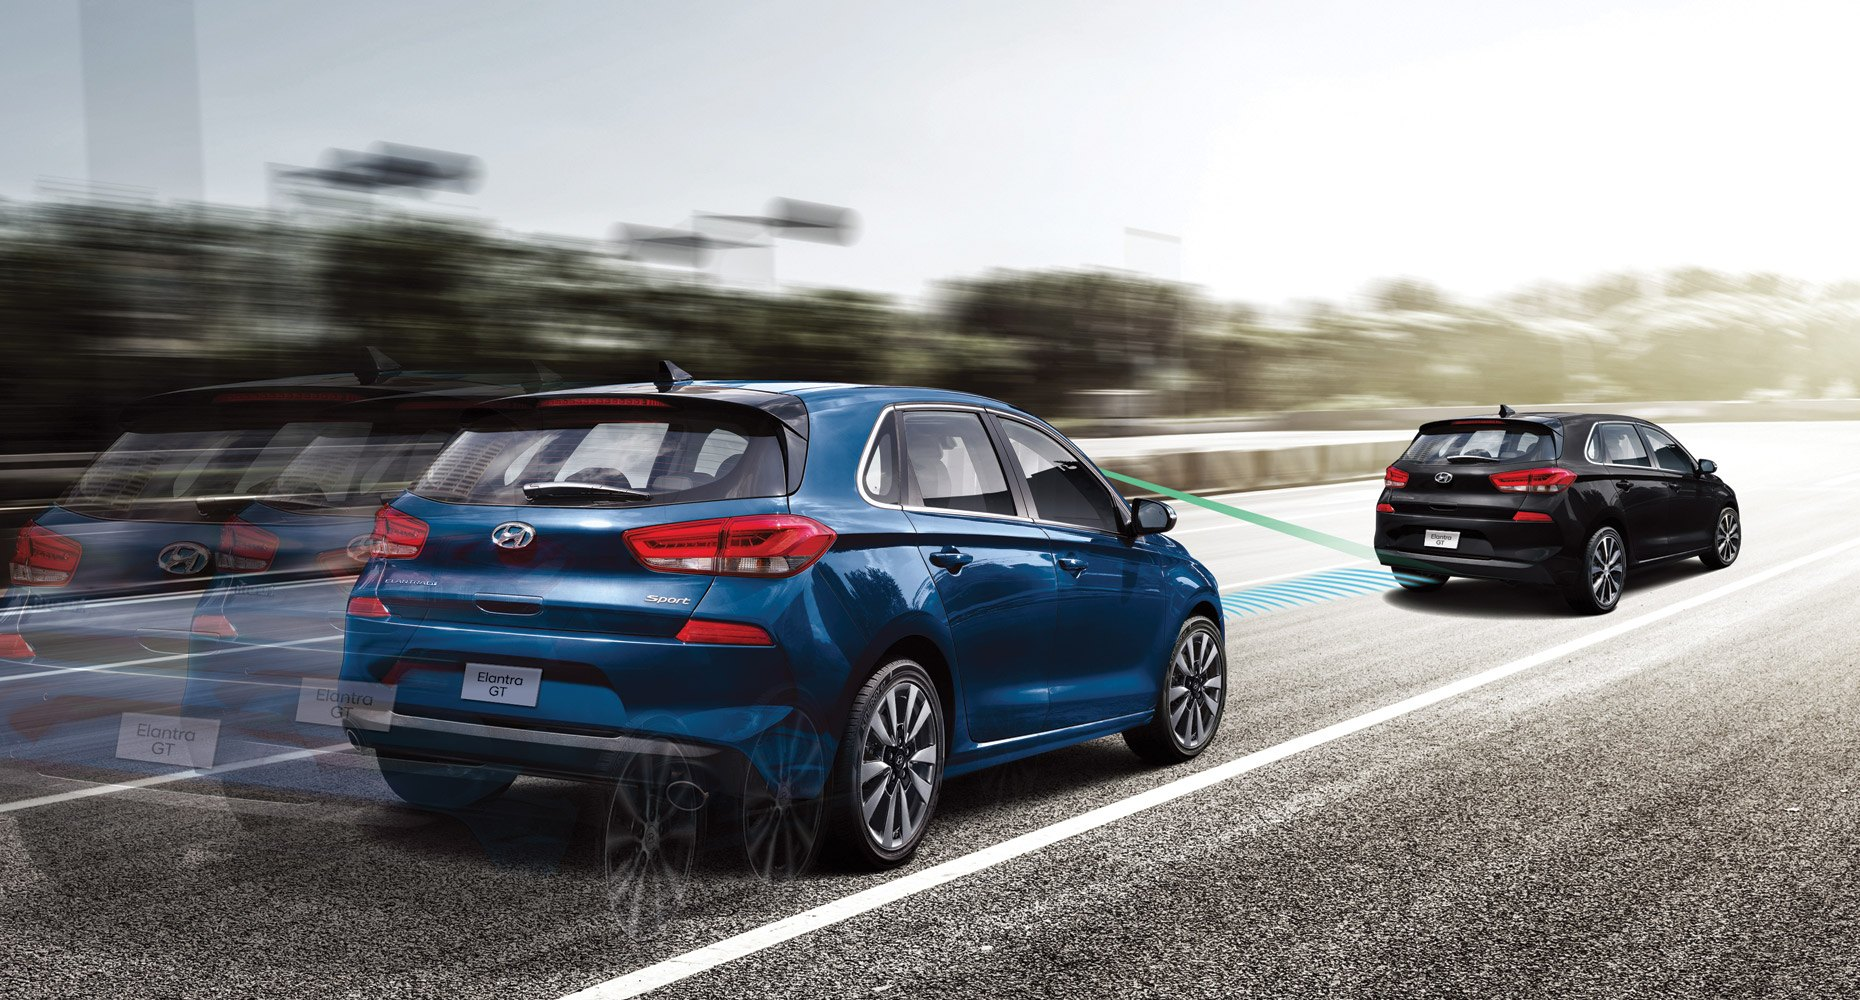 2018 Hyundai Elantra GT Performance Overview